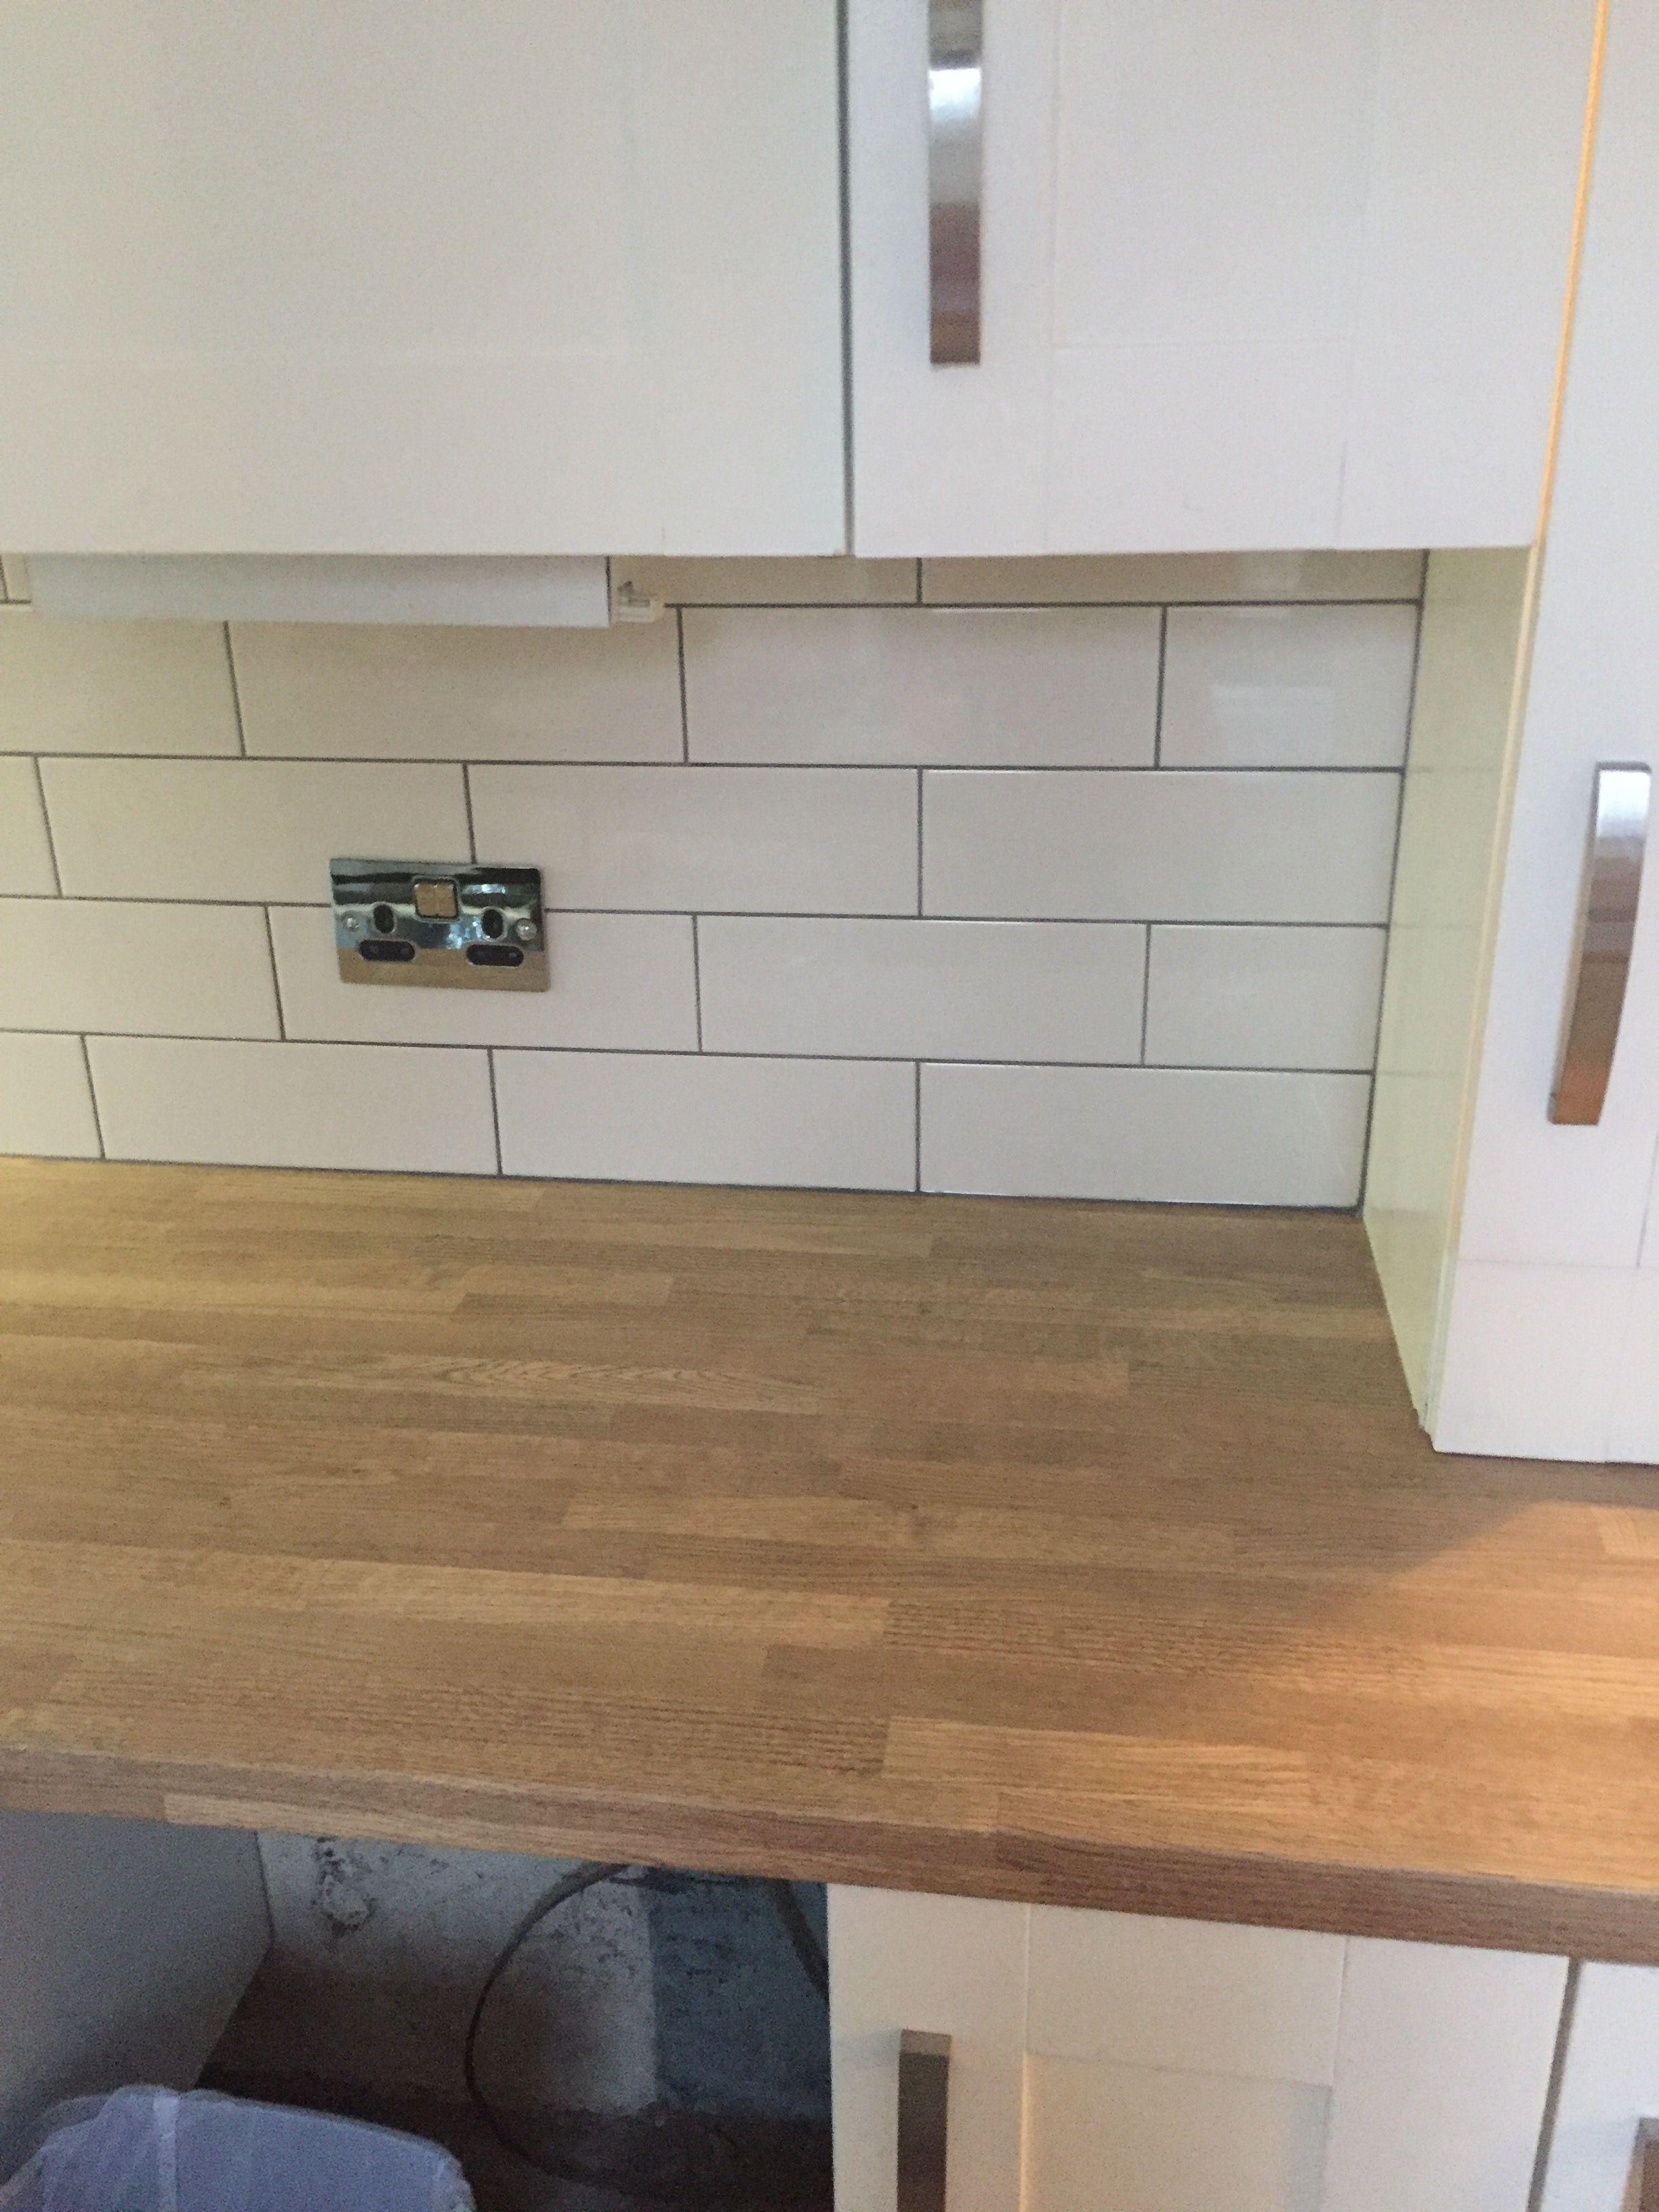 300x100cm Cream Gloss Metro Tile With Dark Grey Grout Kitchen Room Design Kitchen Room Utility Room Designs